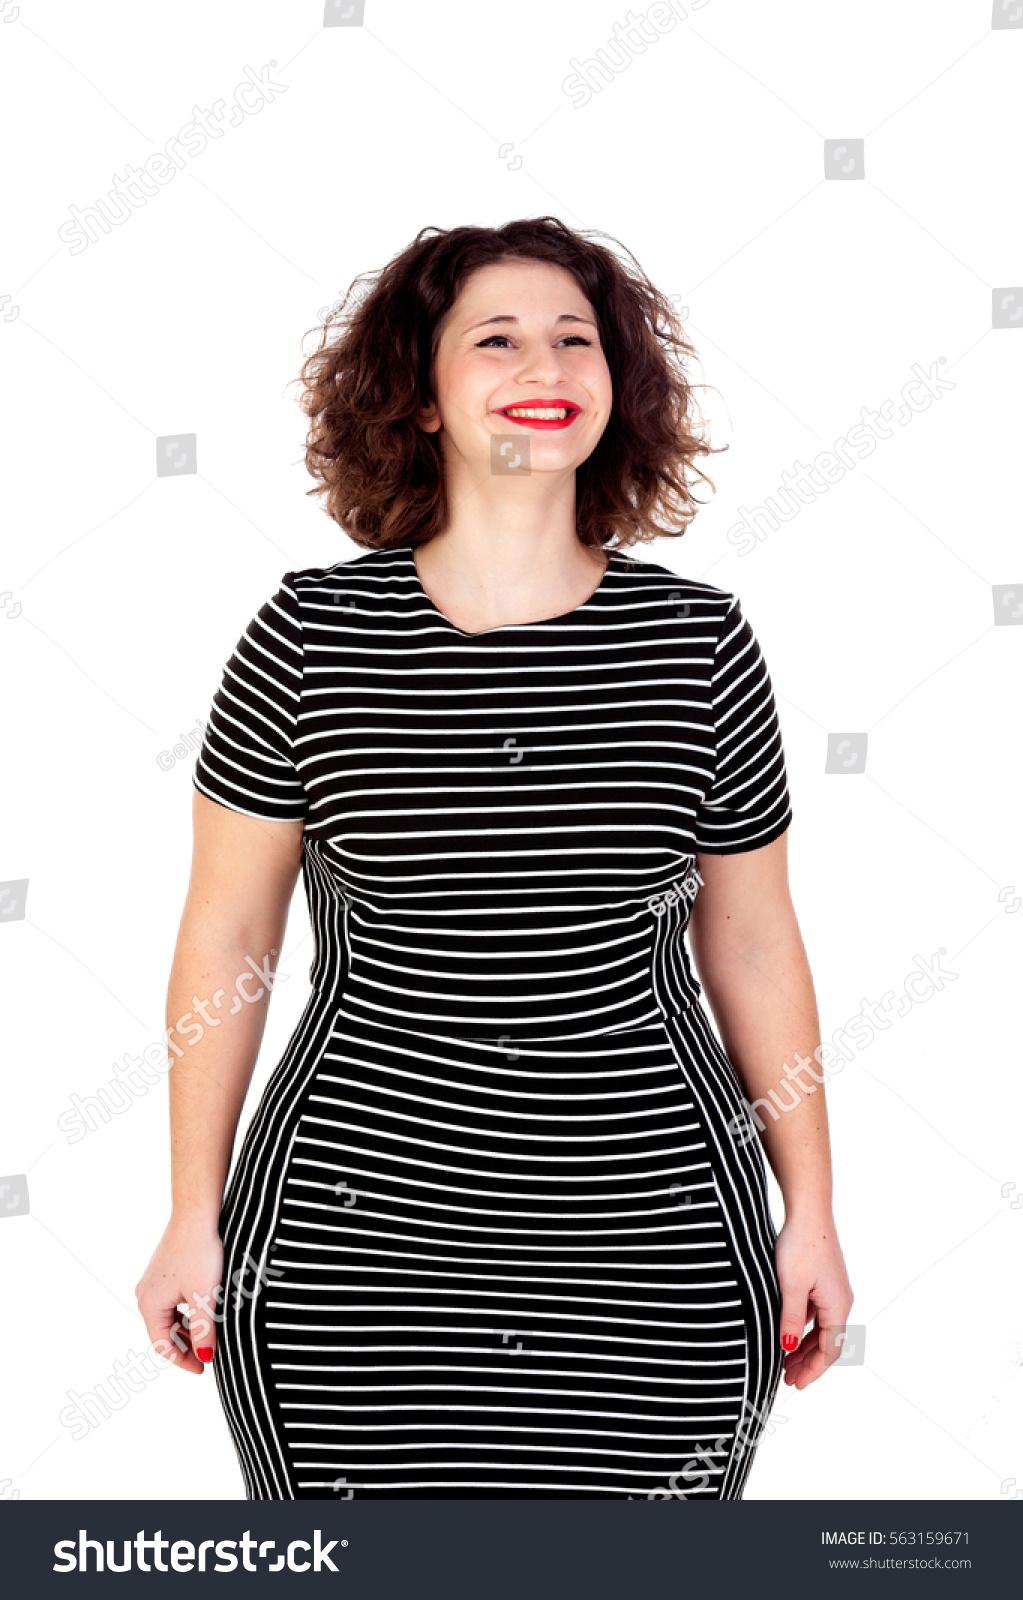 Pensive Beautiful Curvy Girl Striped Dress Stock Photo ...